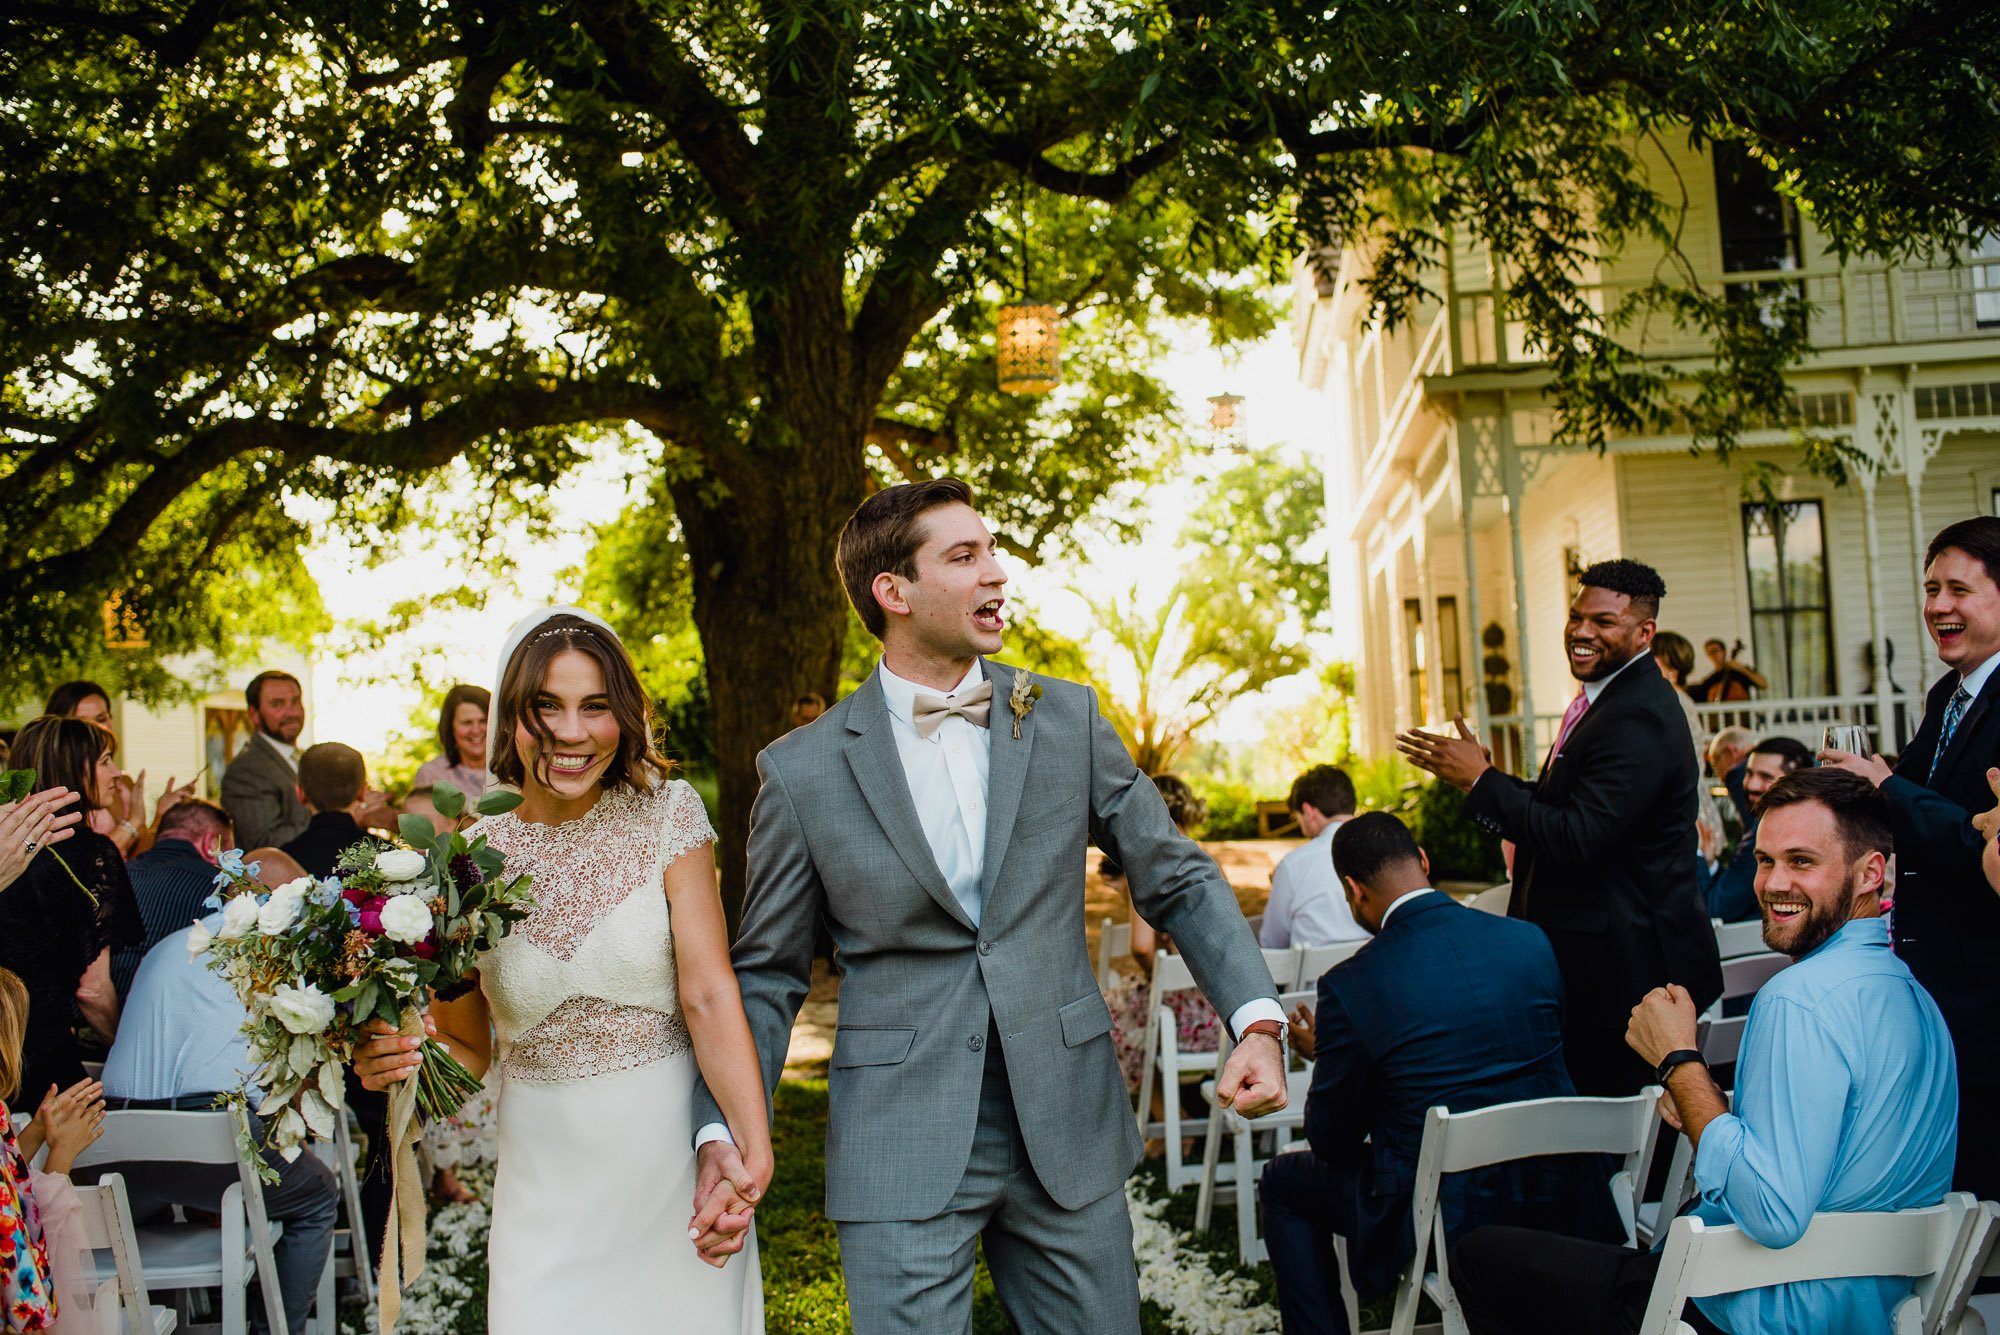 barr mansion wedding, summer wedding outdoors, austin wedding at the barr mansion